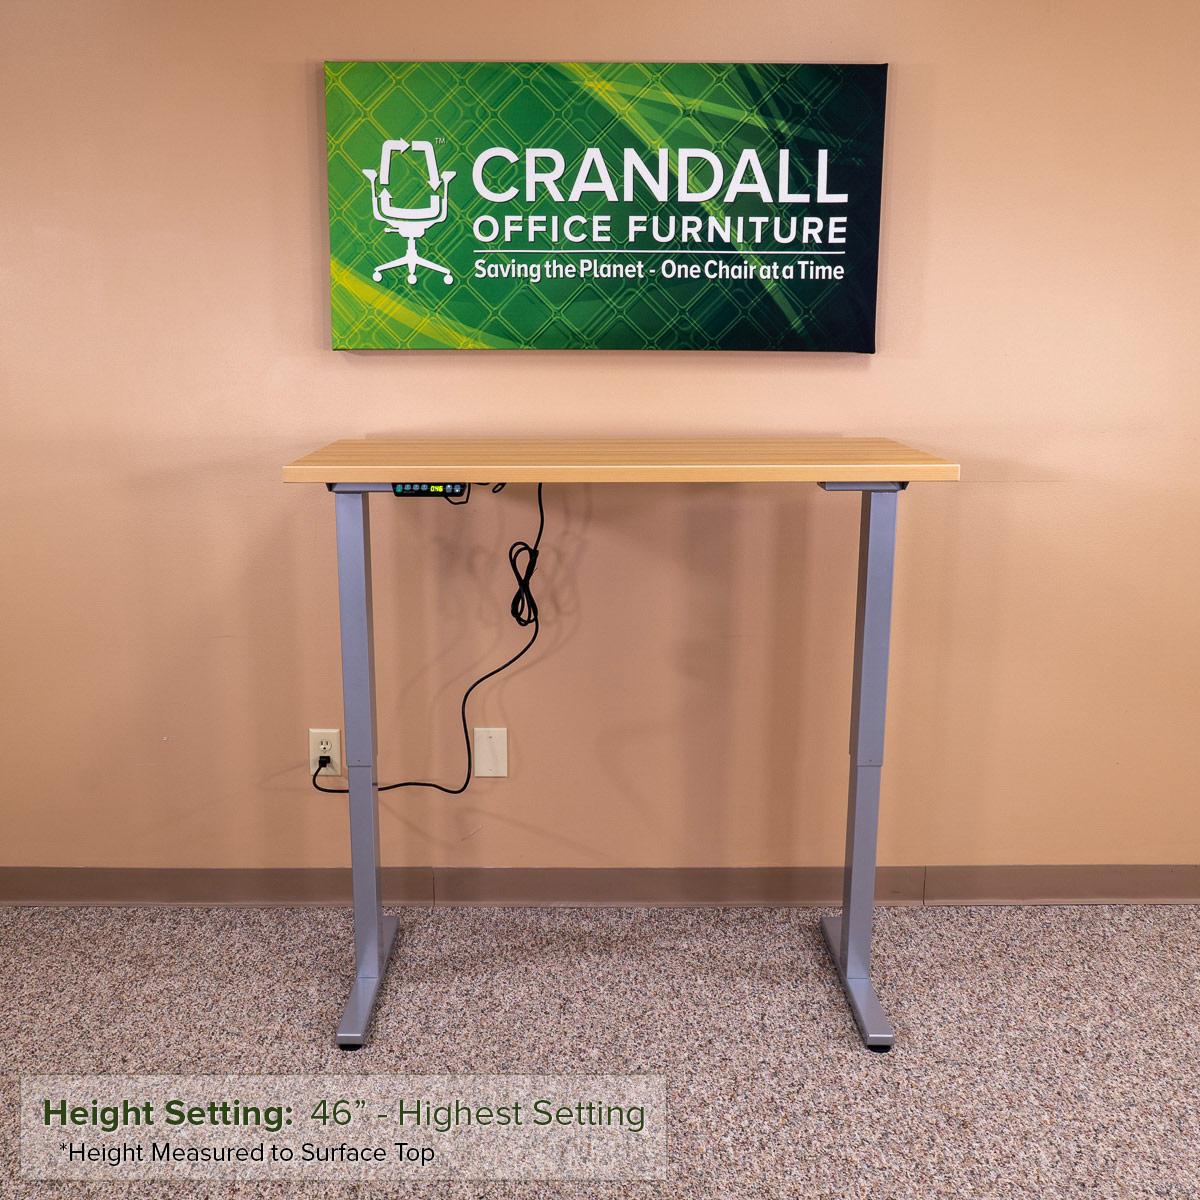 Crandall-Office-Furniture-ErgomatIQ Height-Adjustable-Desk-014